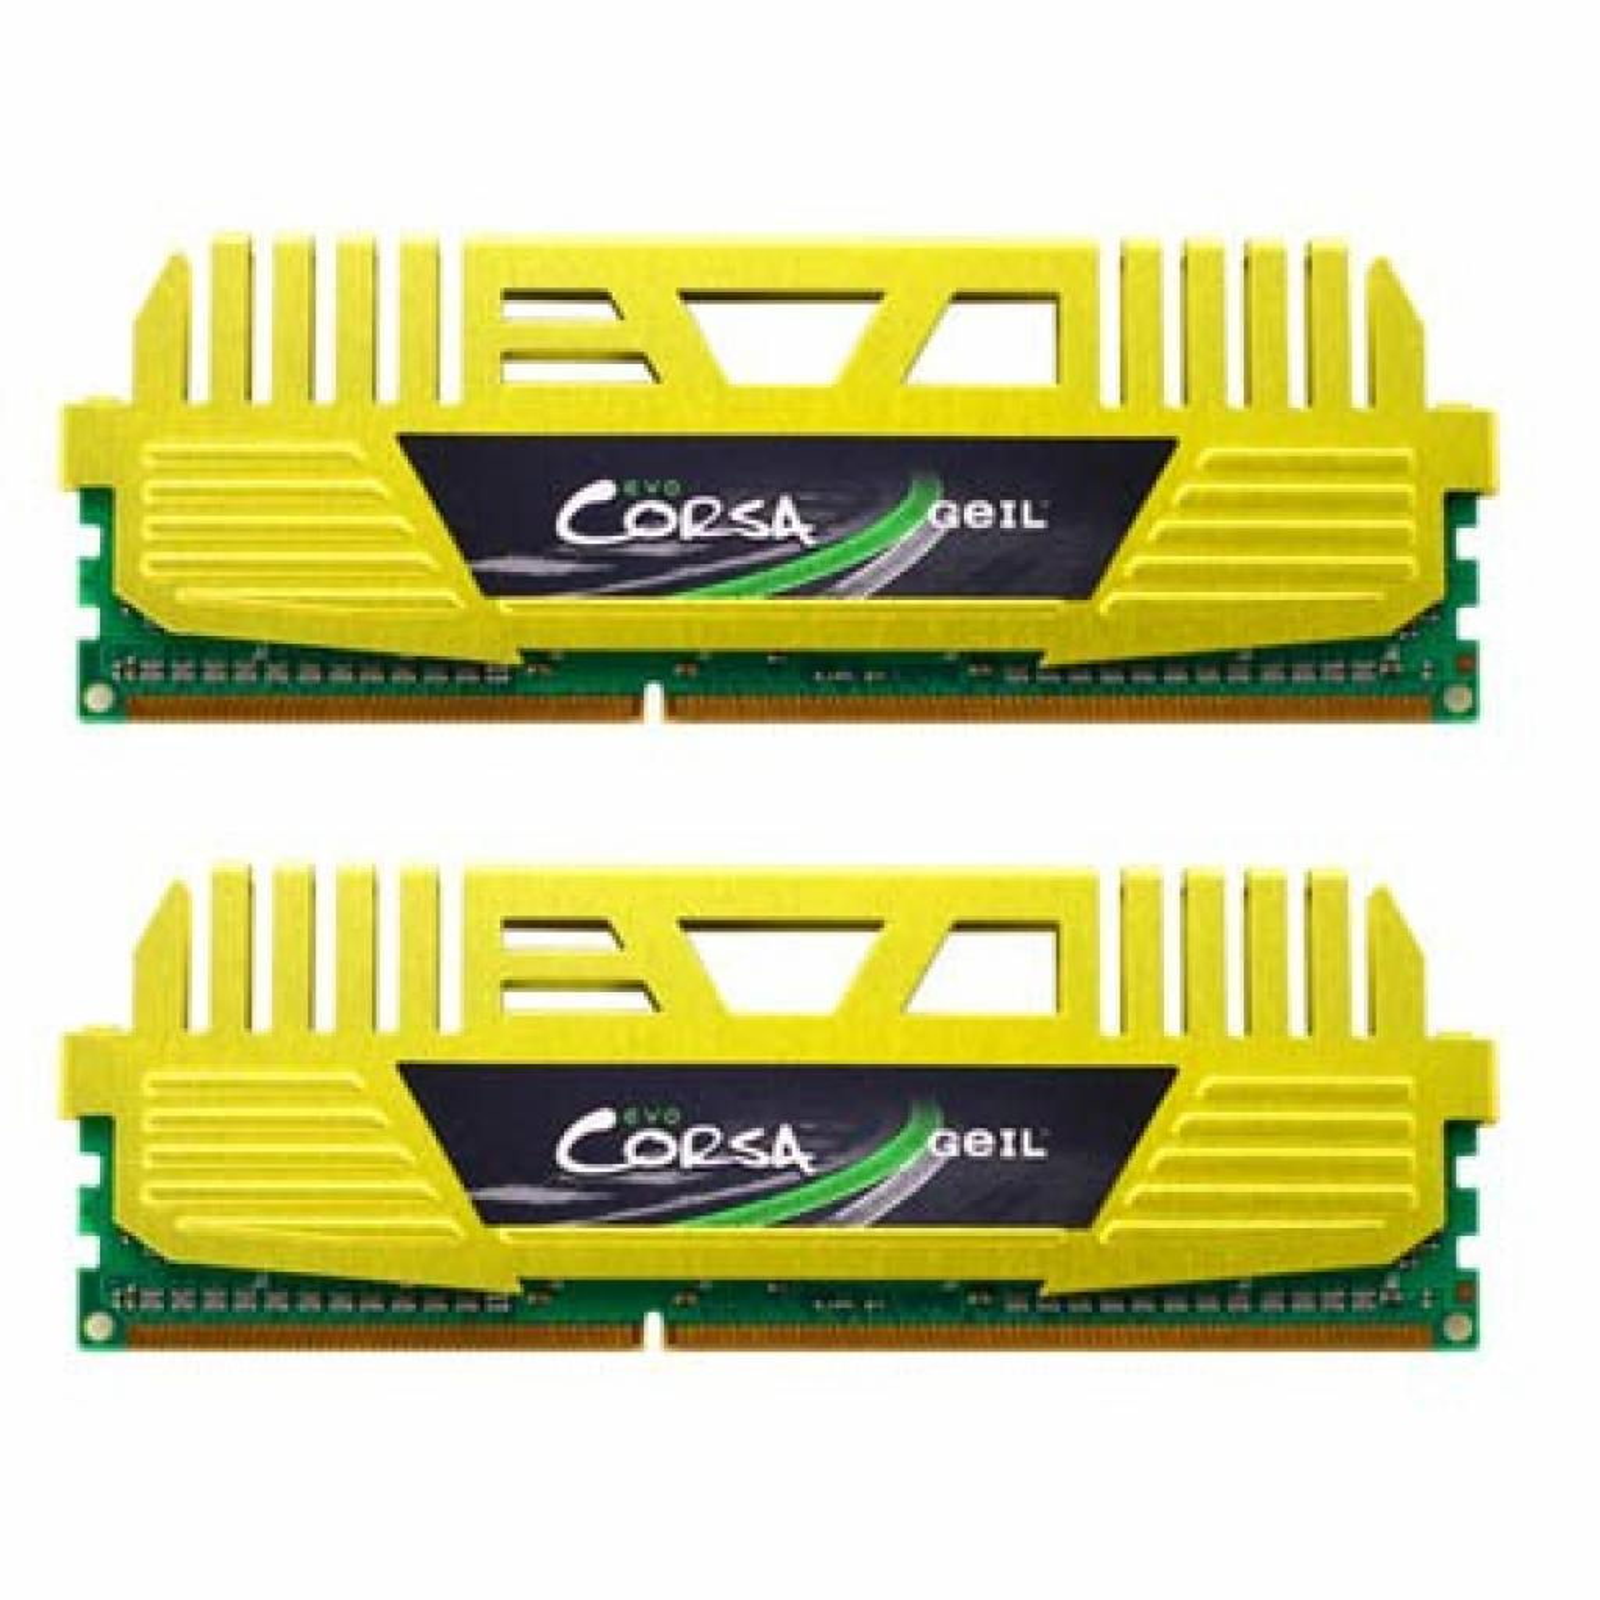 Модуль памяти для компьютера DDR3 16GB (2x8GB) 1333 MHz GEIL (GOC316GB1333C9DC)